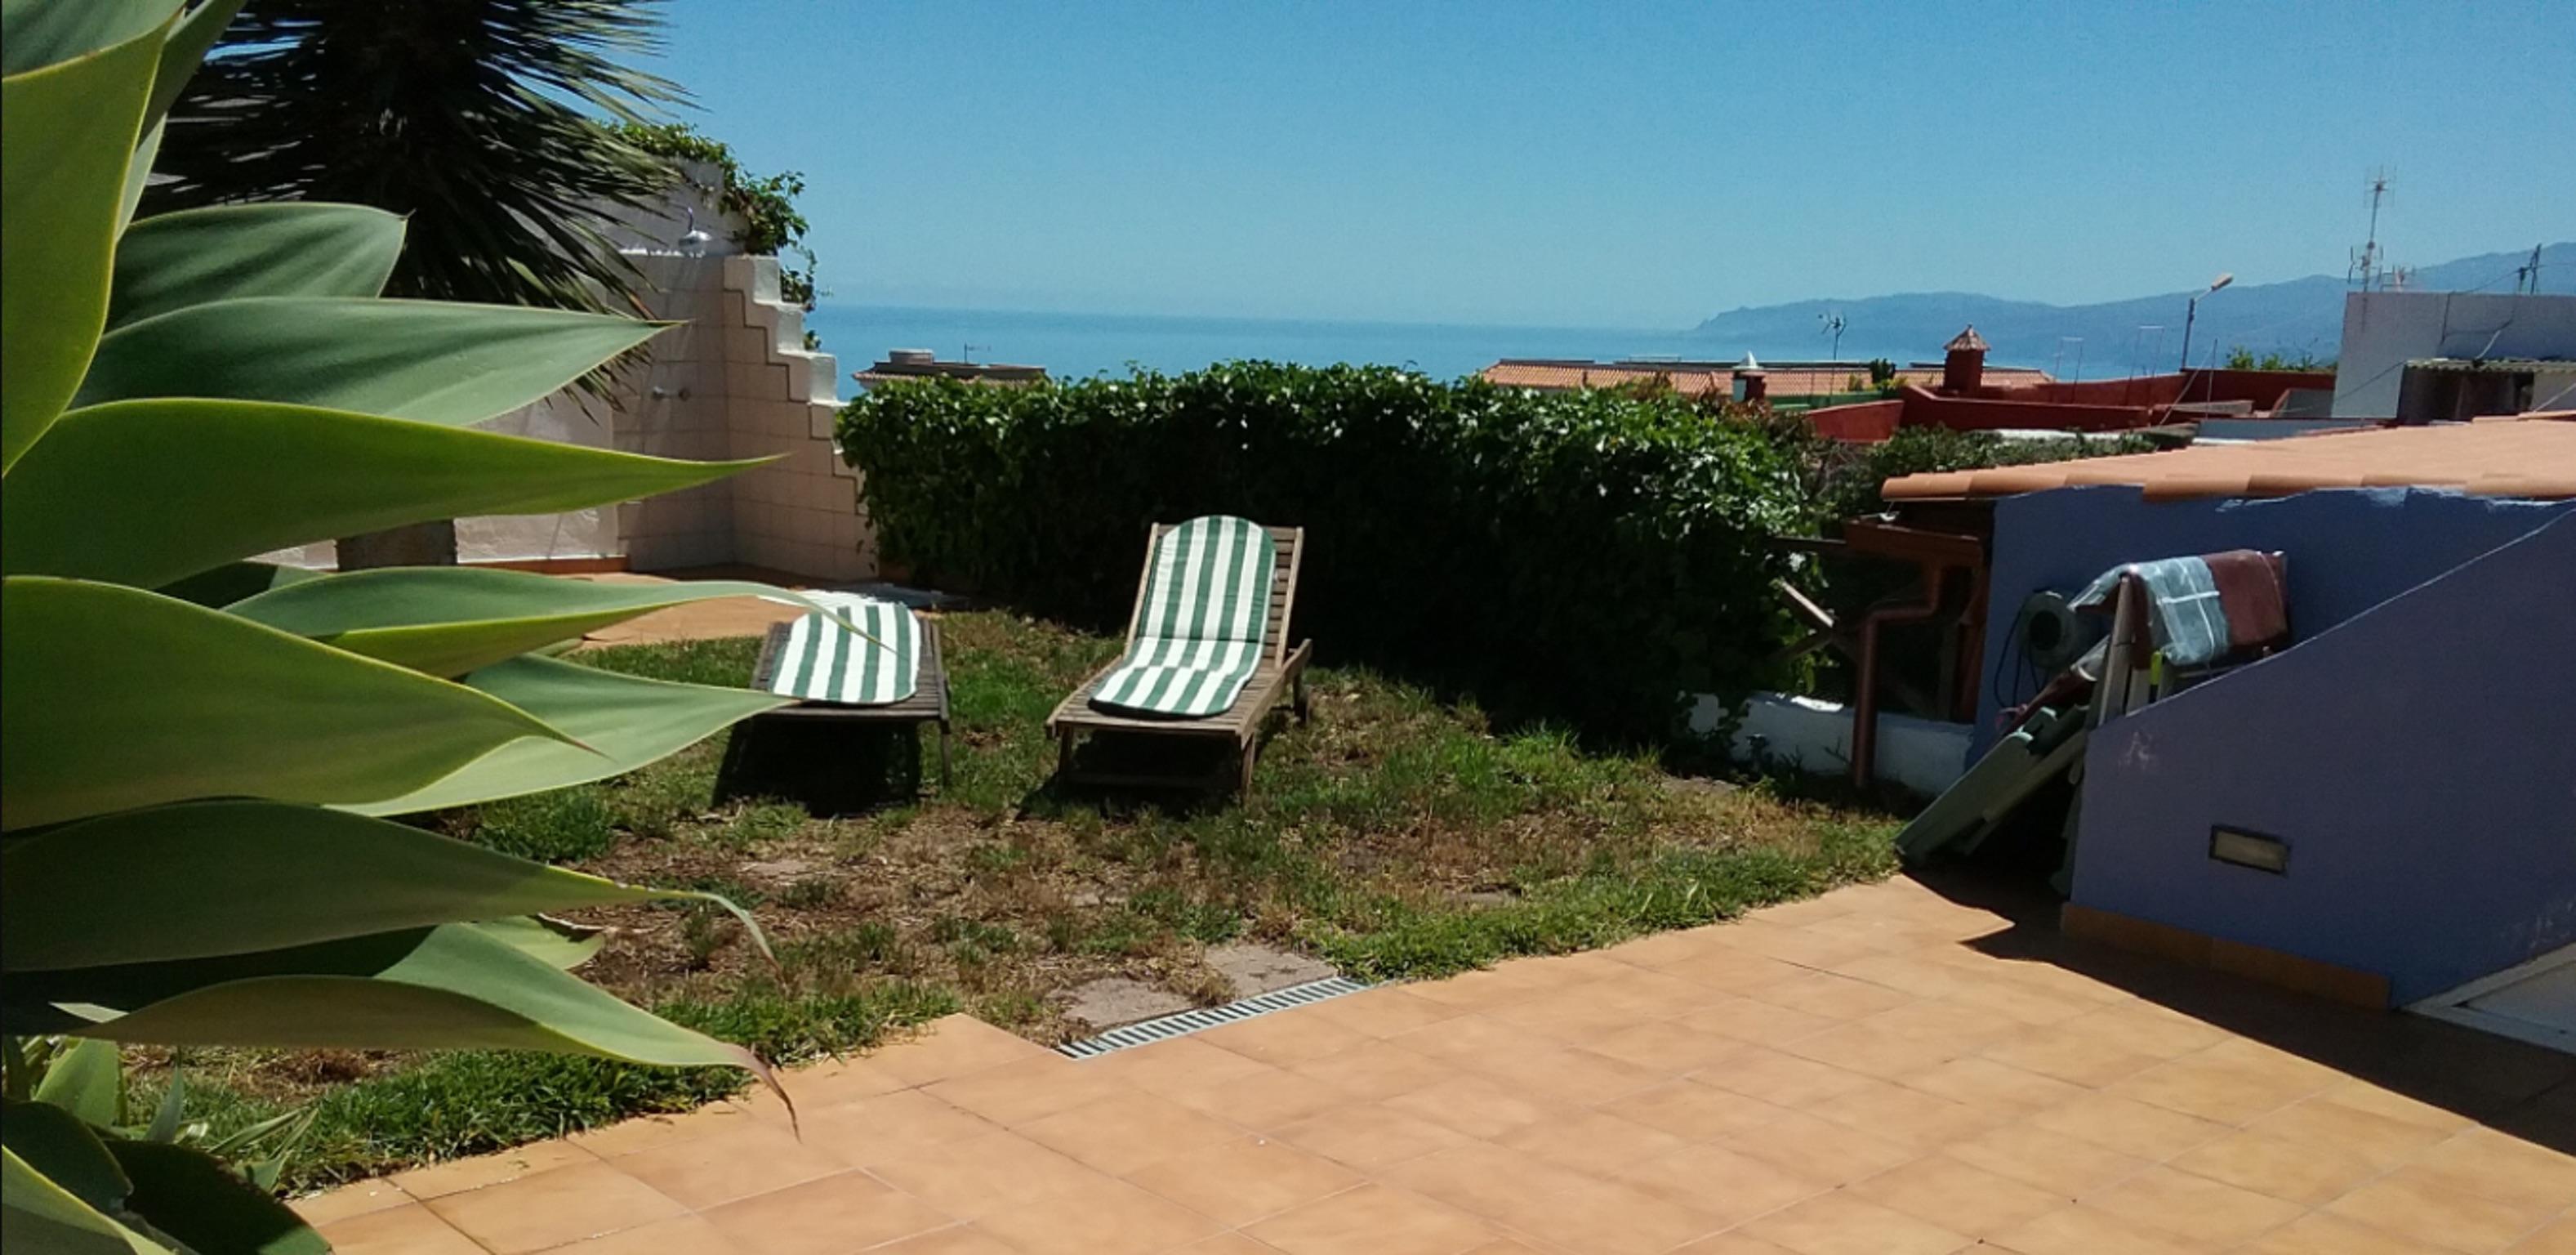 Haus mit 2 Zimmern in El Tanque, Santa Cruz de Tenerife mit ...